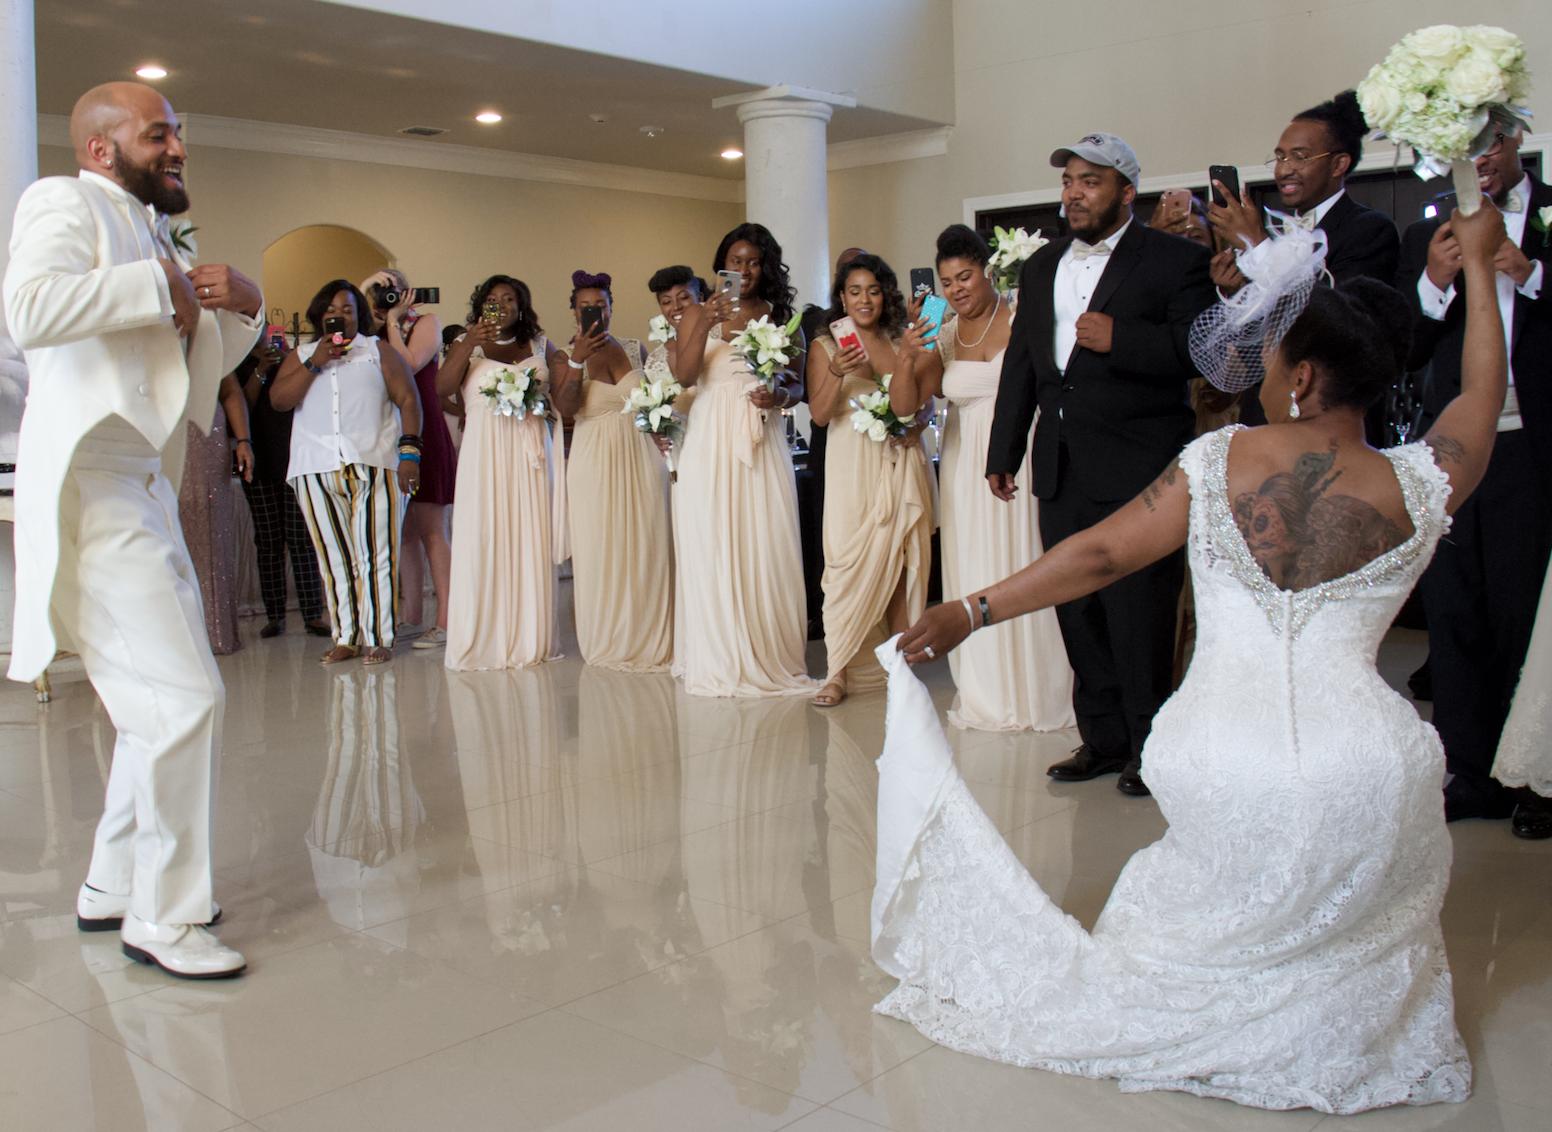 Cir-ron photography, Creative Genius Works, Mann's Wedding